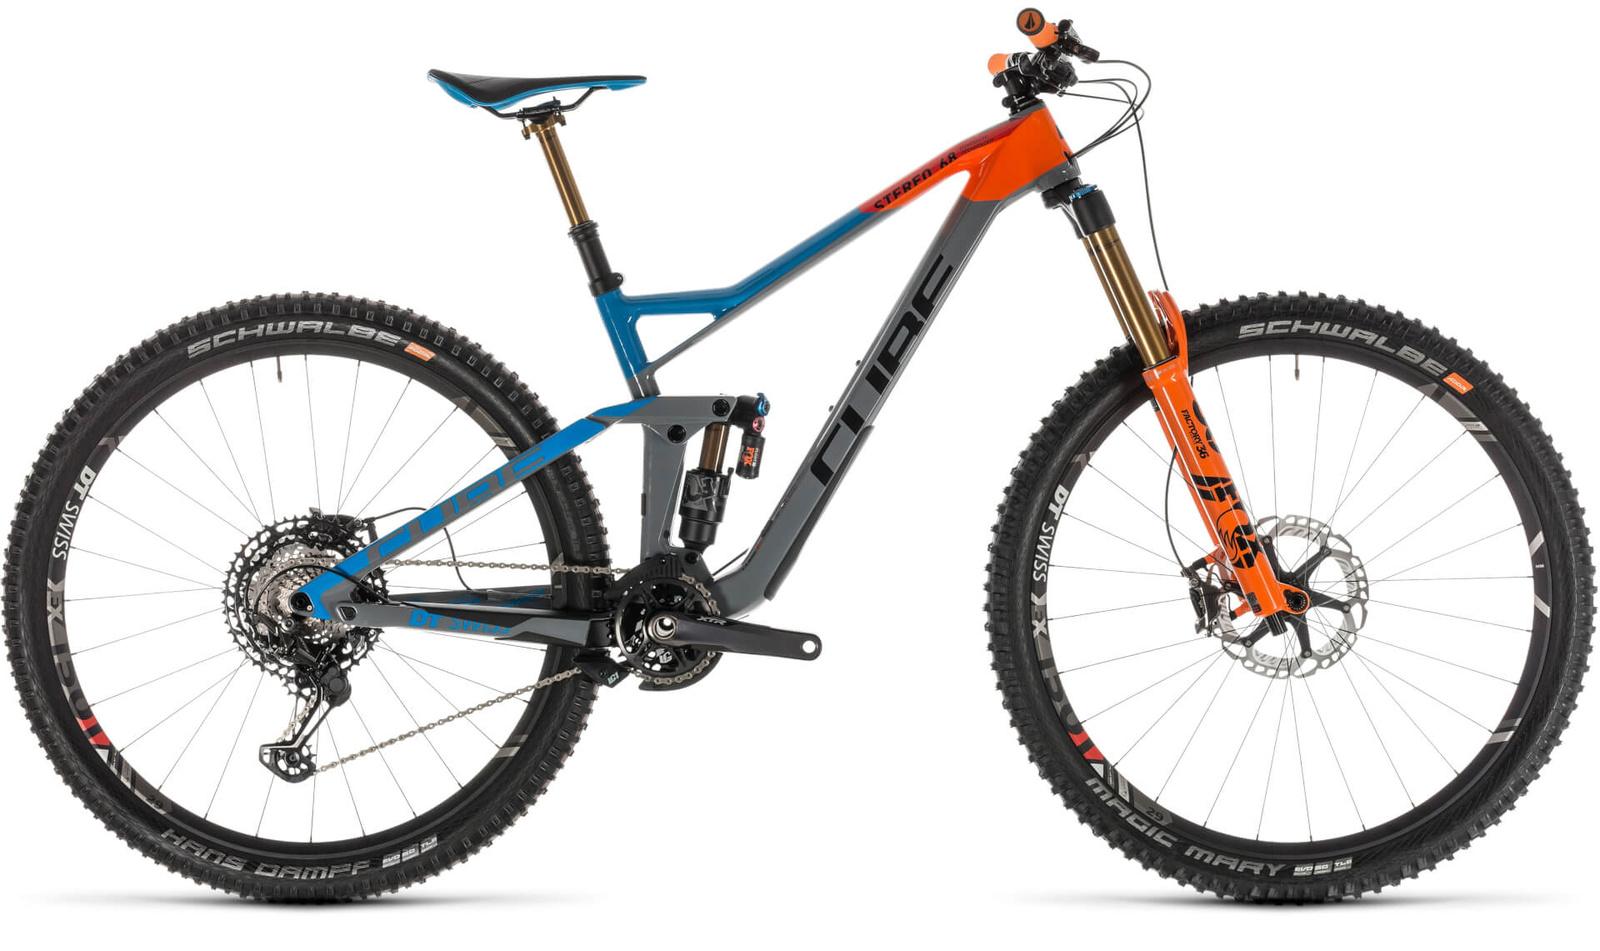 cube mountainbike neuheiten 2019 rabe bike. Black Bedroom Furniture Sets. Home Design Ideas